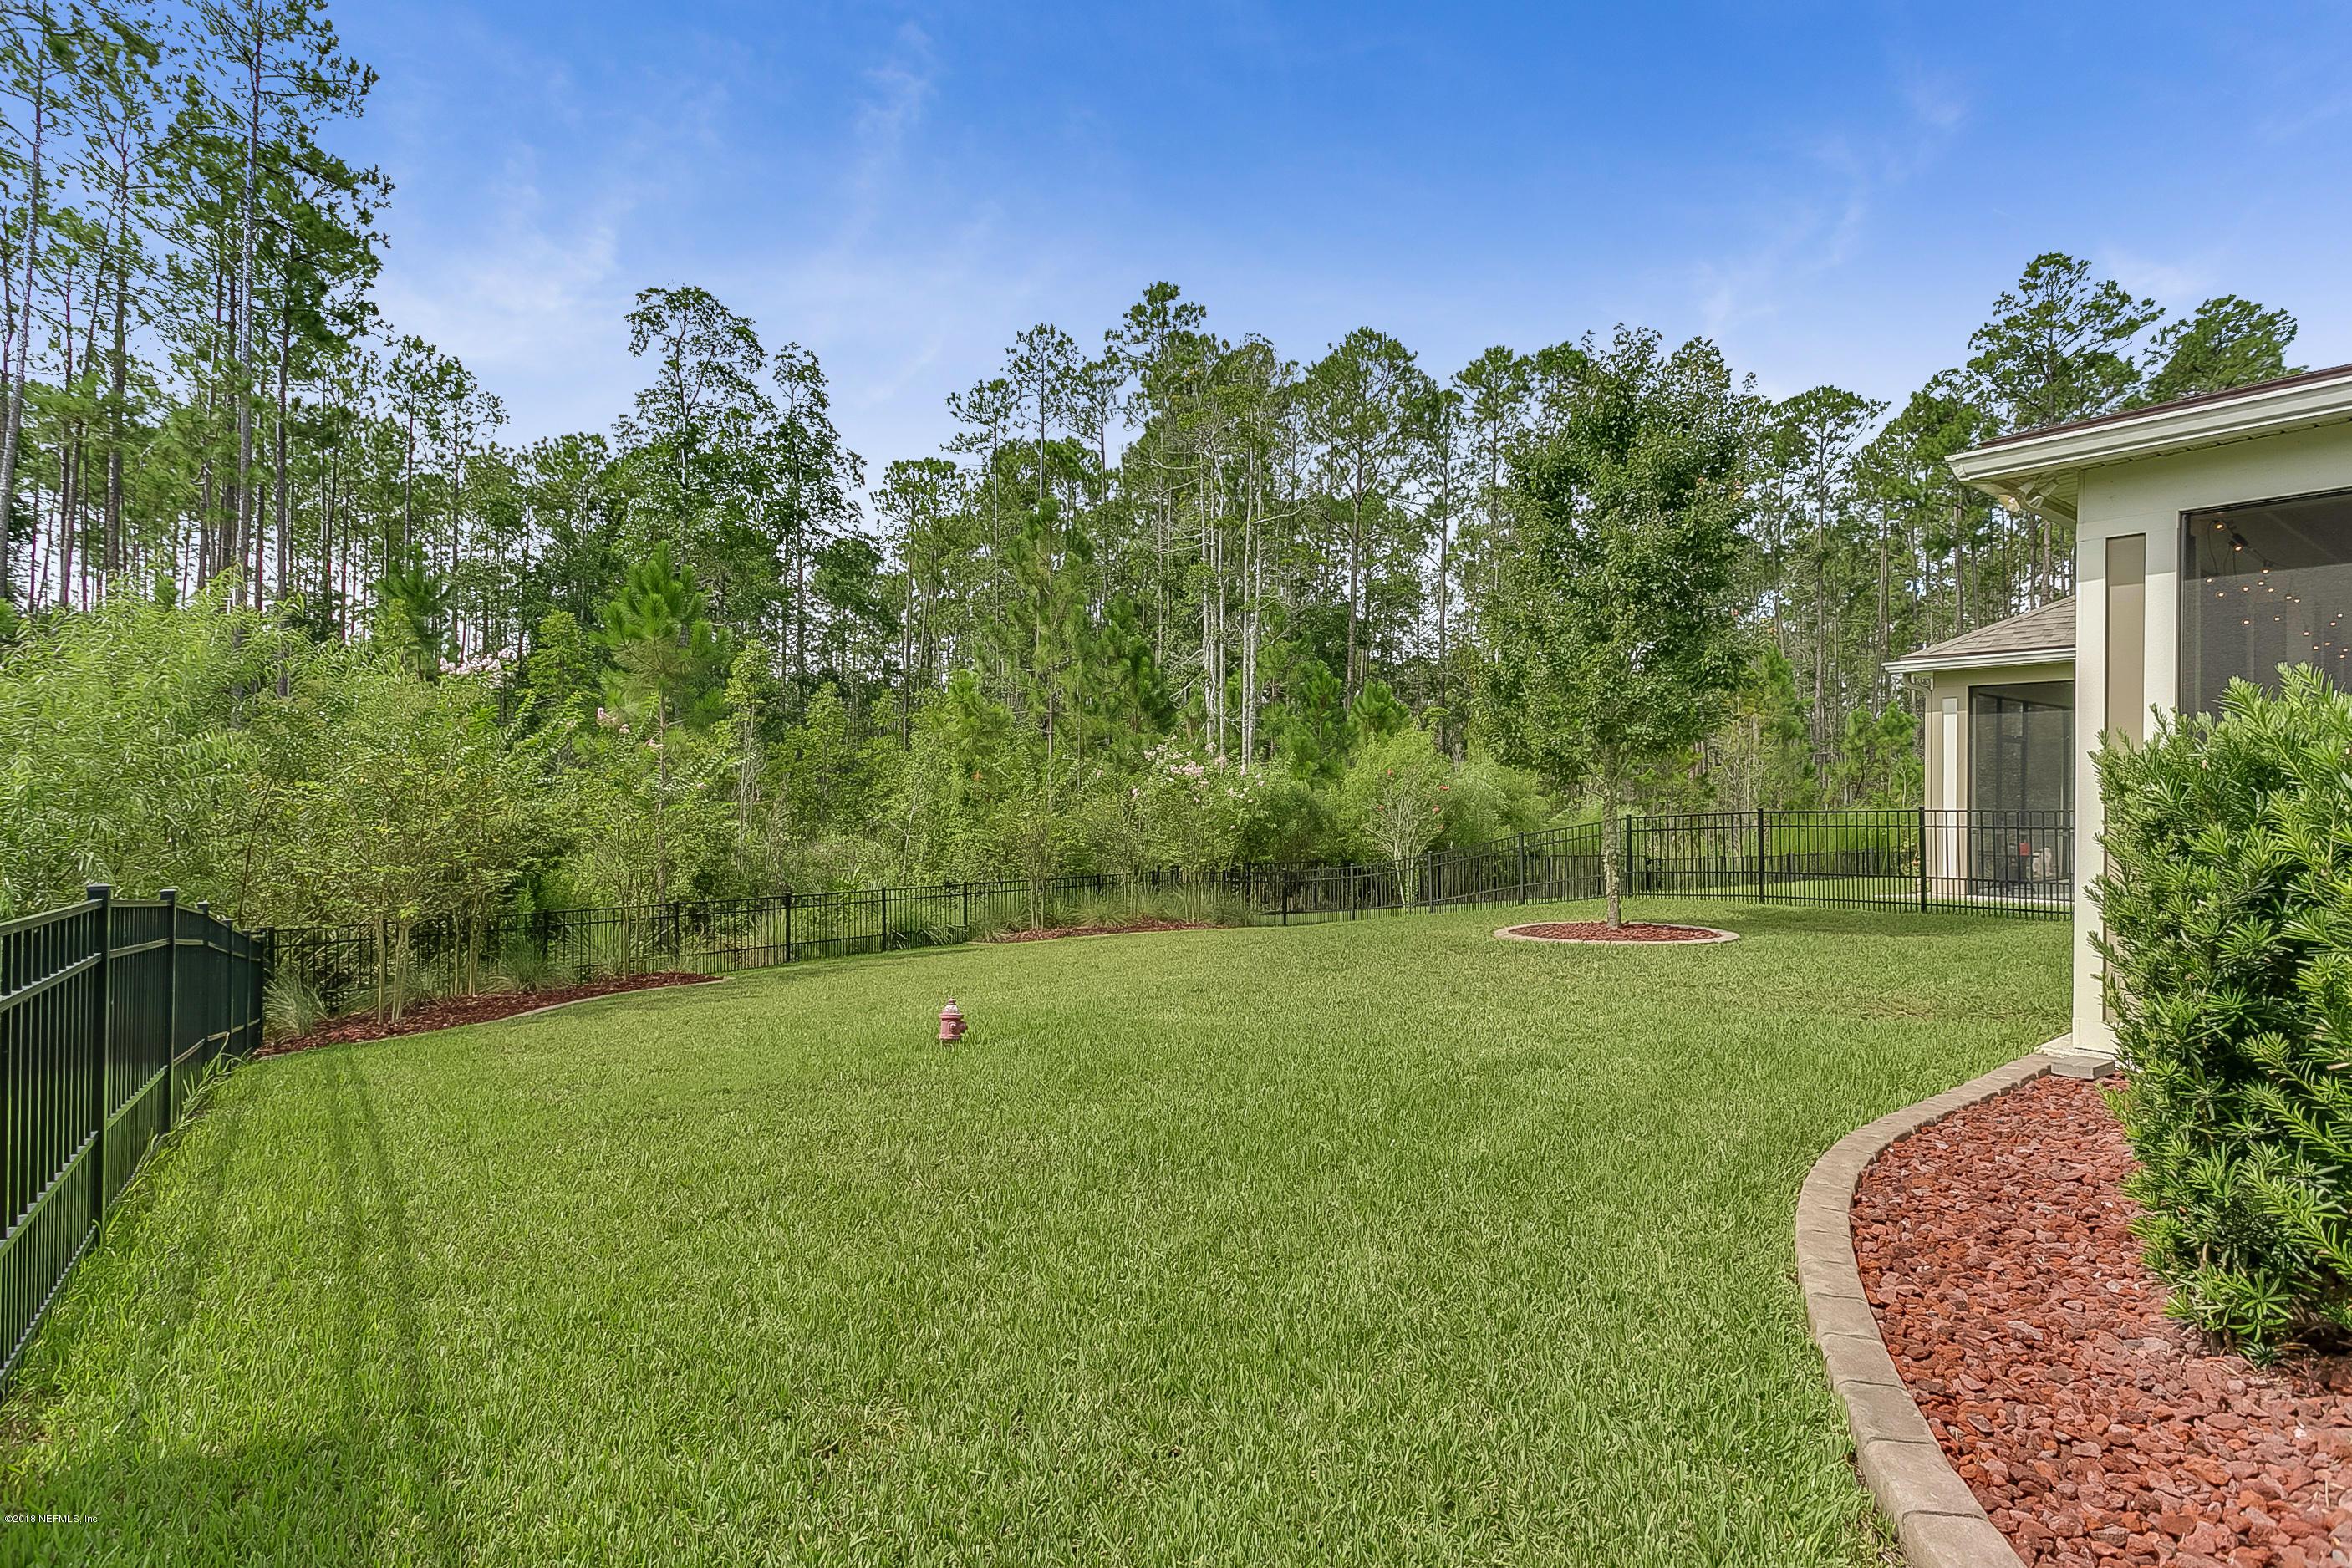 127 WHITE MARSH, PONTE VEDRA, FLORIDA 32081, 4 Bedrooms Bedrooms, ,3 BathroomsBathrooms,Residential - single family,For sale,WHITE MARSH,979349